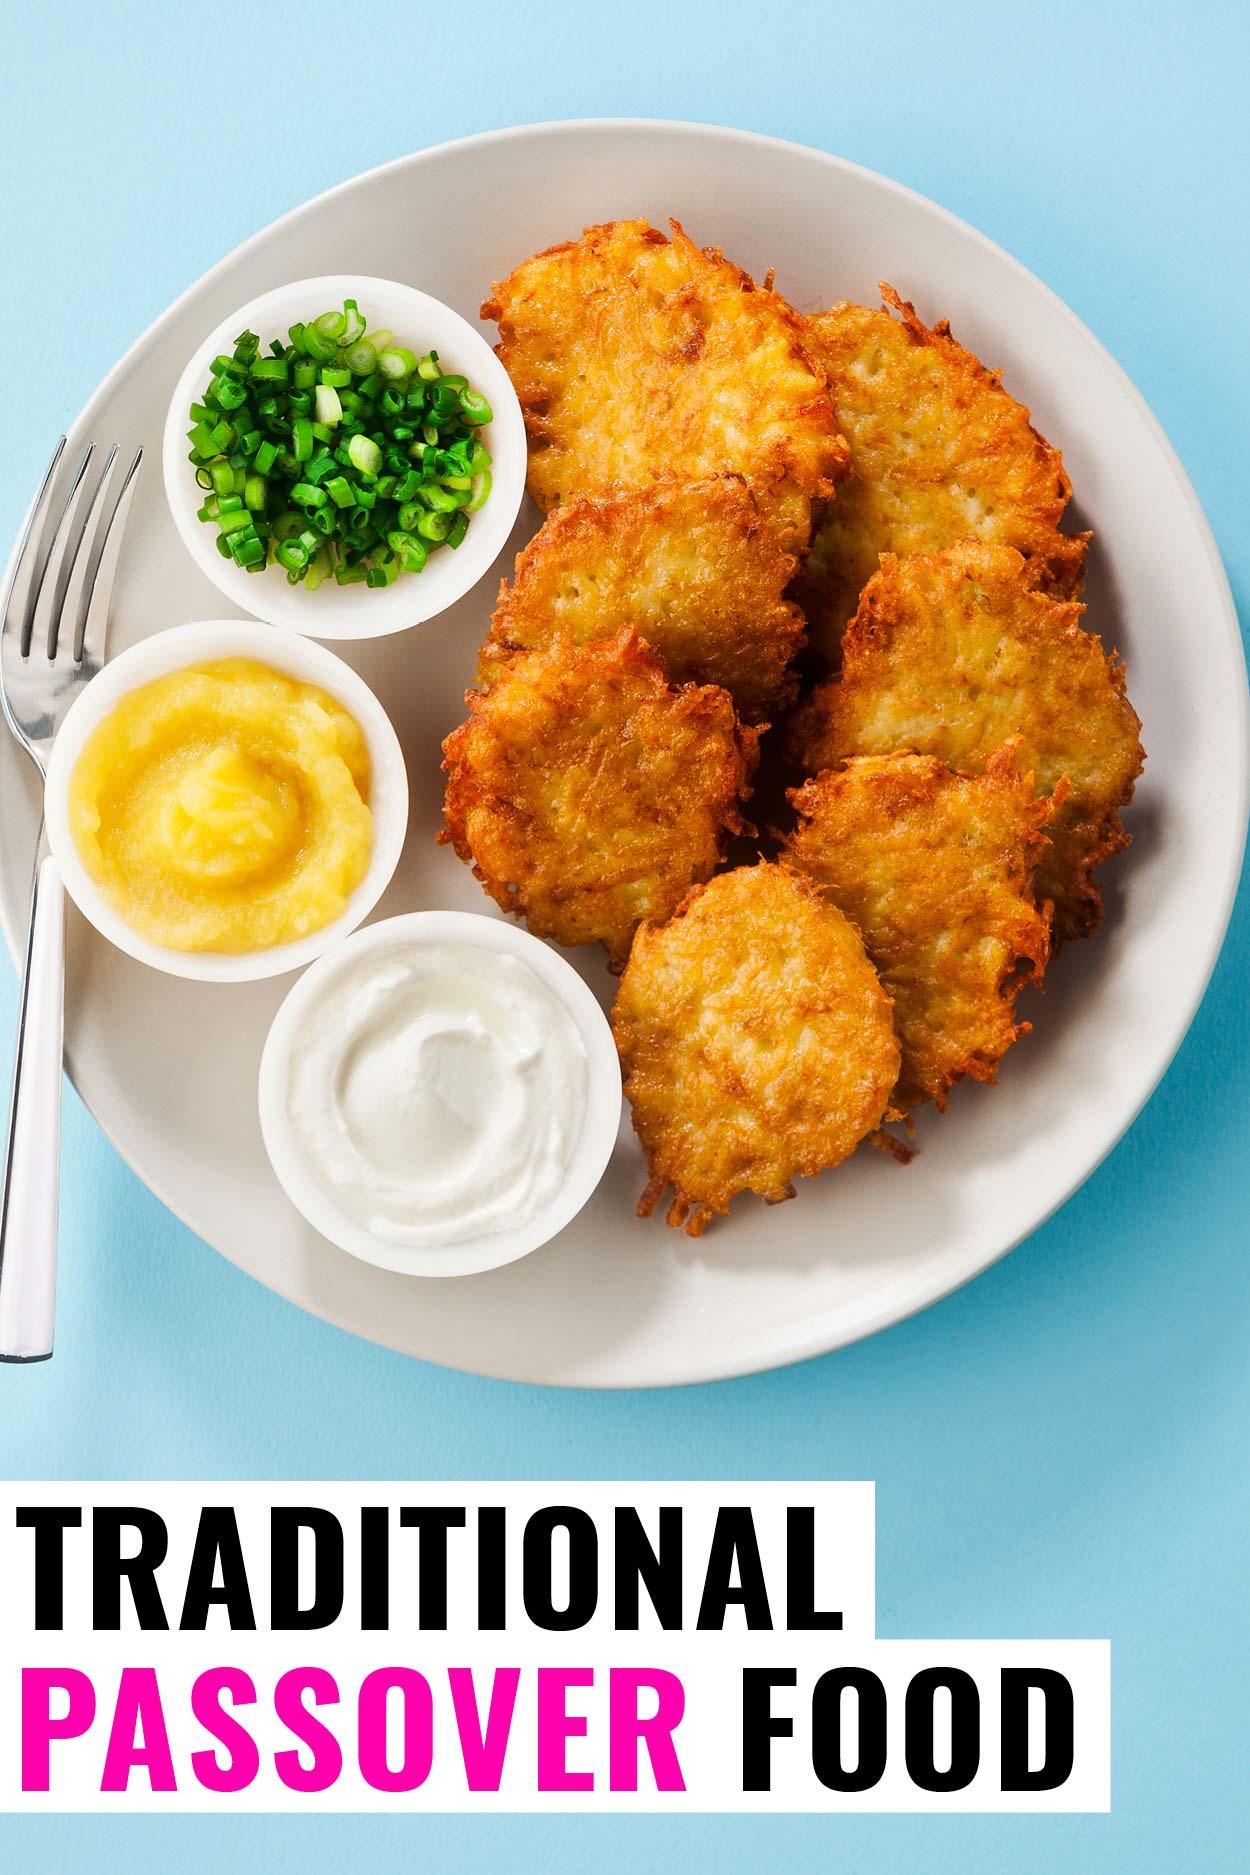 Passover food plate of potato latkes